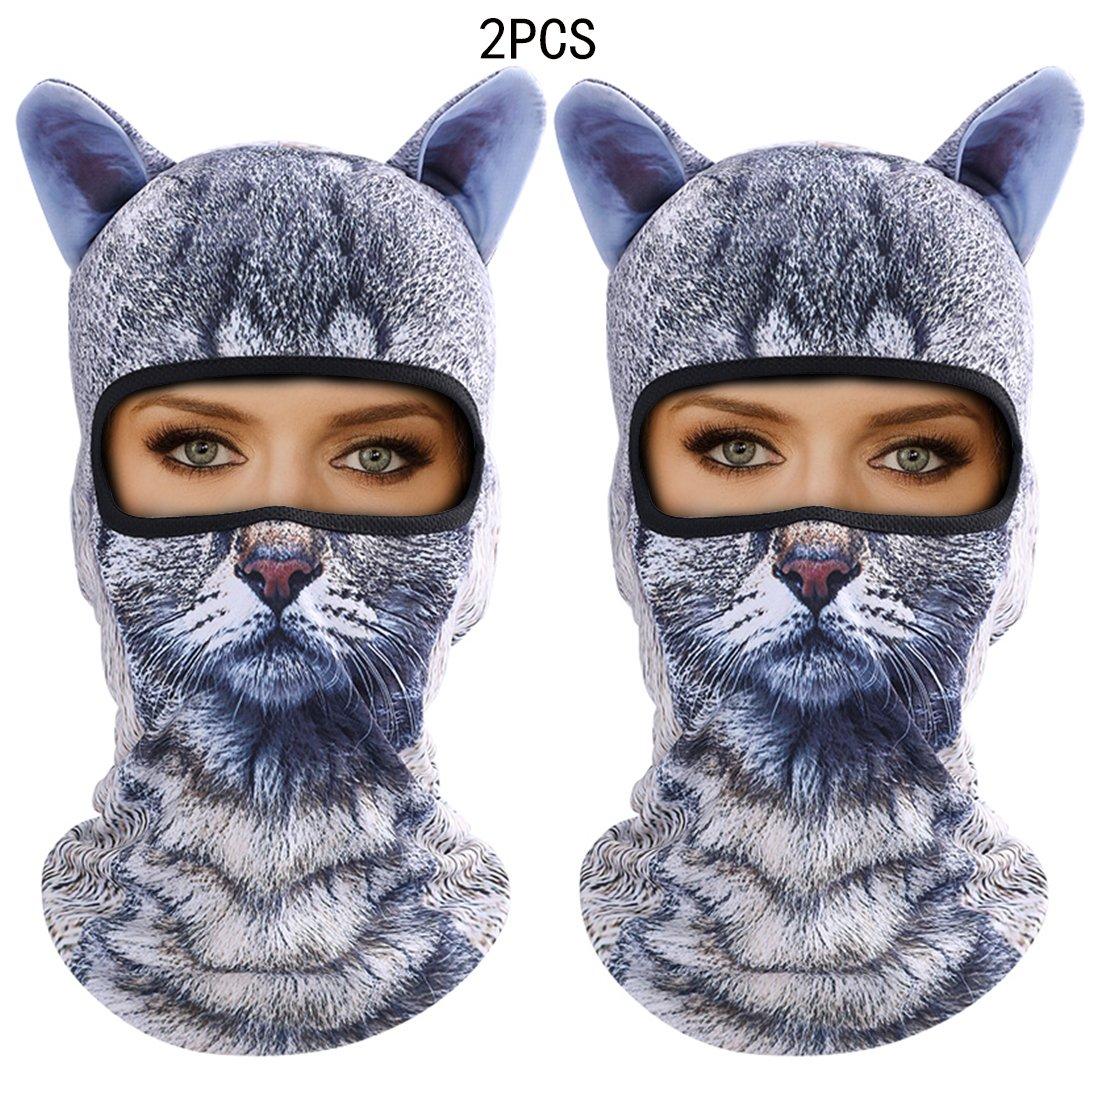 Outgeek Cat Mask, Women Men Balaclava Summer Full Face Hat Animal Ears Sports Helmet Climbing Fishing Cap (2PCS Cats) by Outgeek (Image #1)